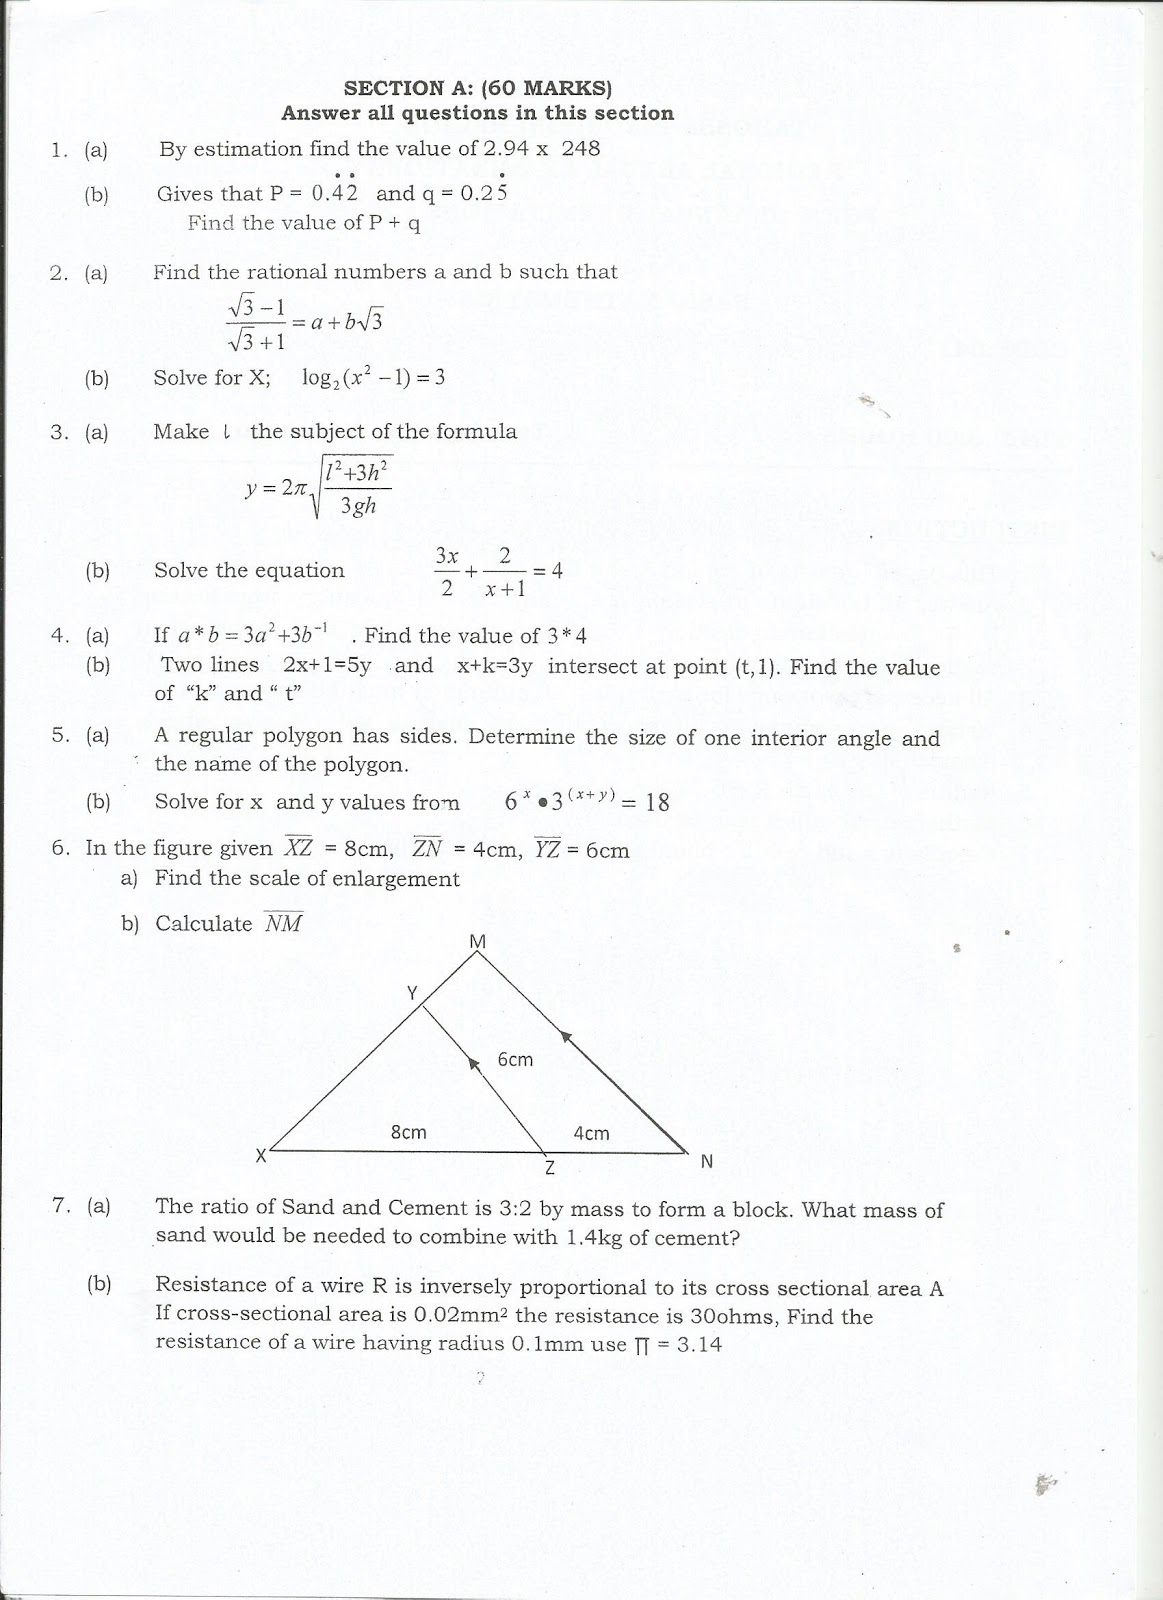 MWL JAPHET MASATU BLOG: BASIC MATHEMATICS--FORM THREE ANNUAL